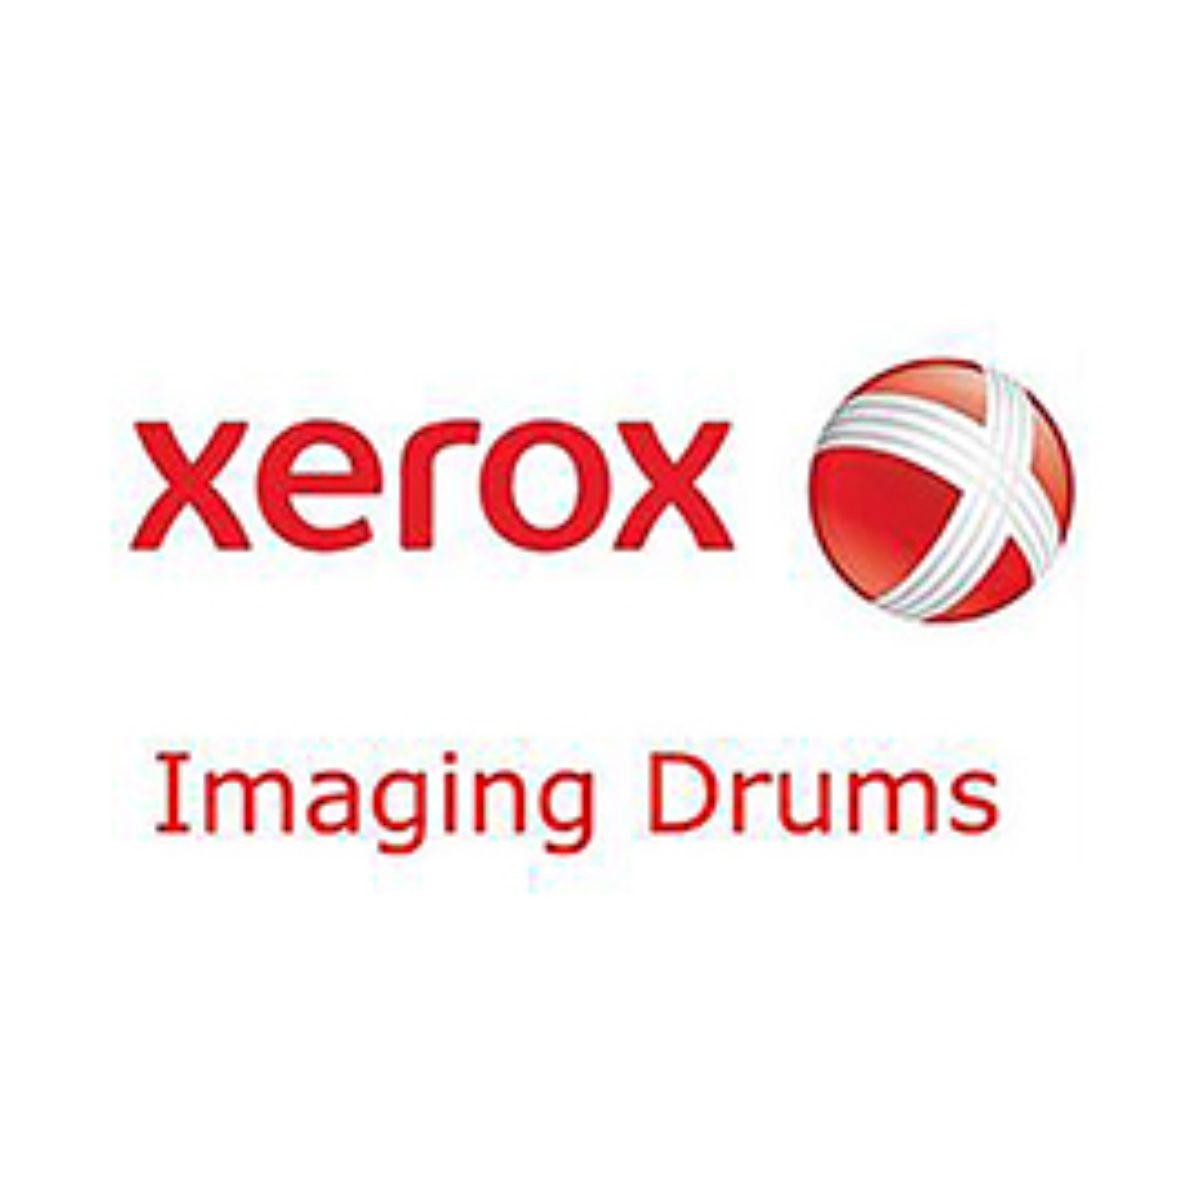 Image of Xerox Phaser 7100 Cmy Imaging